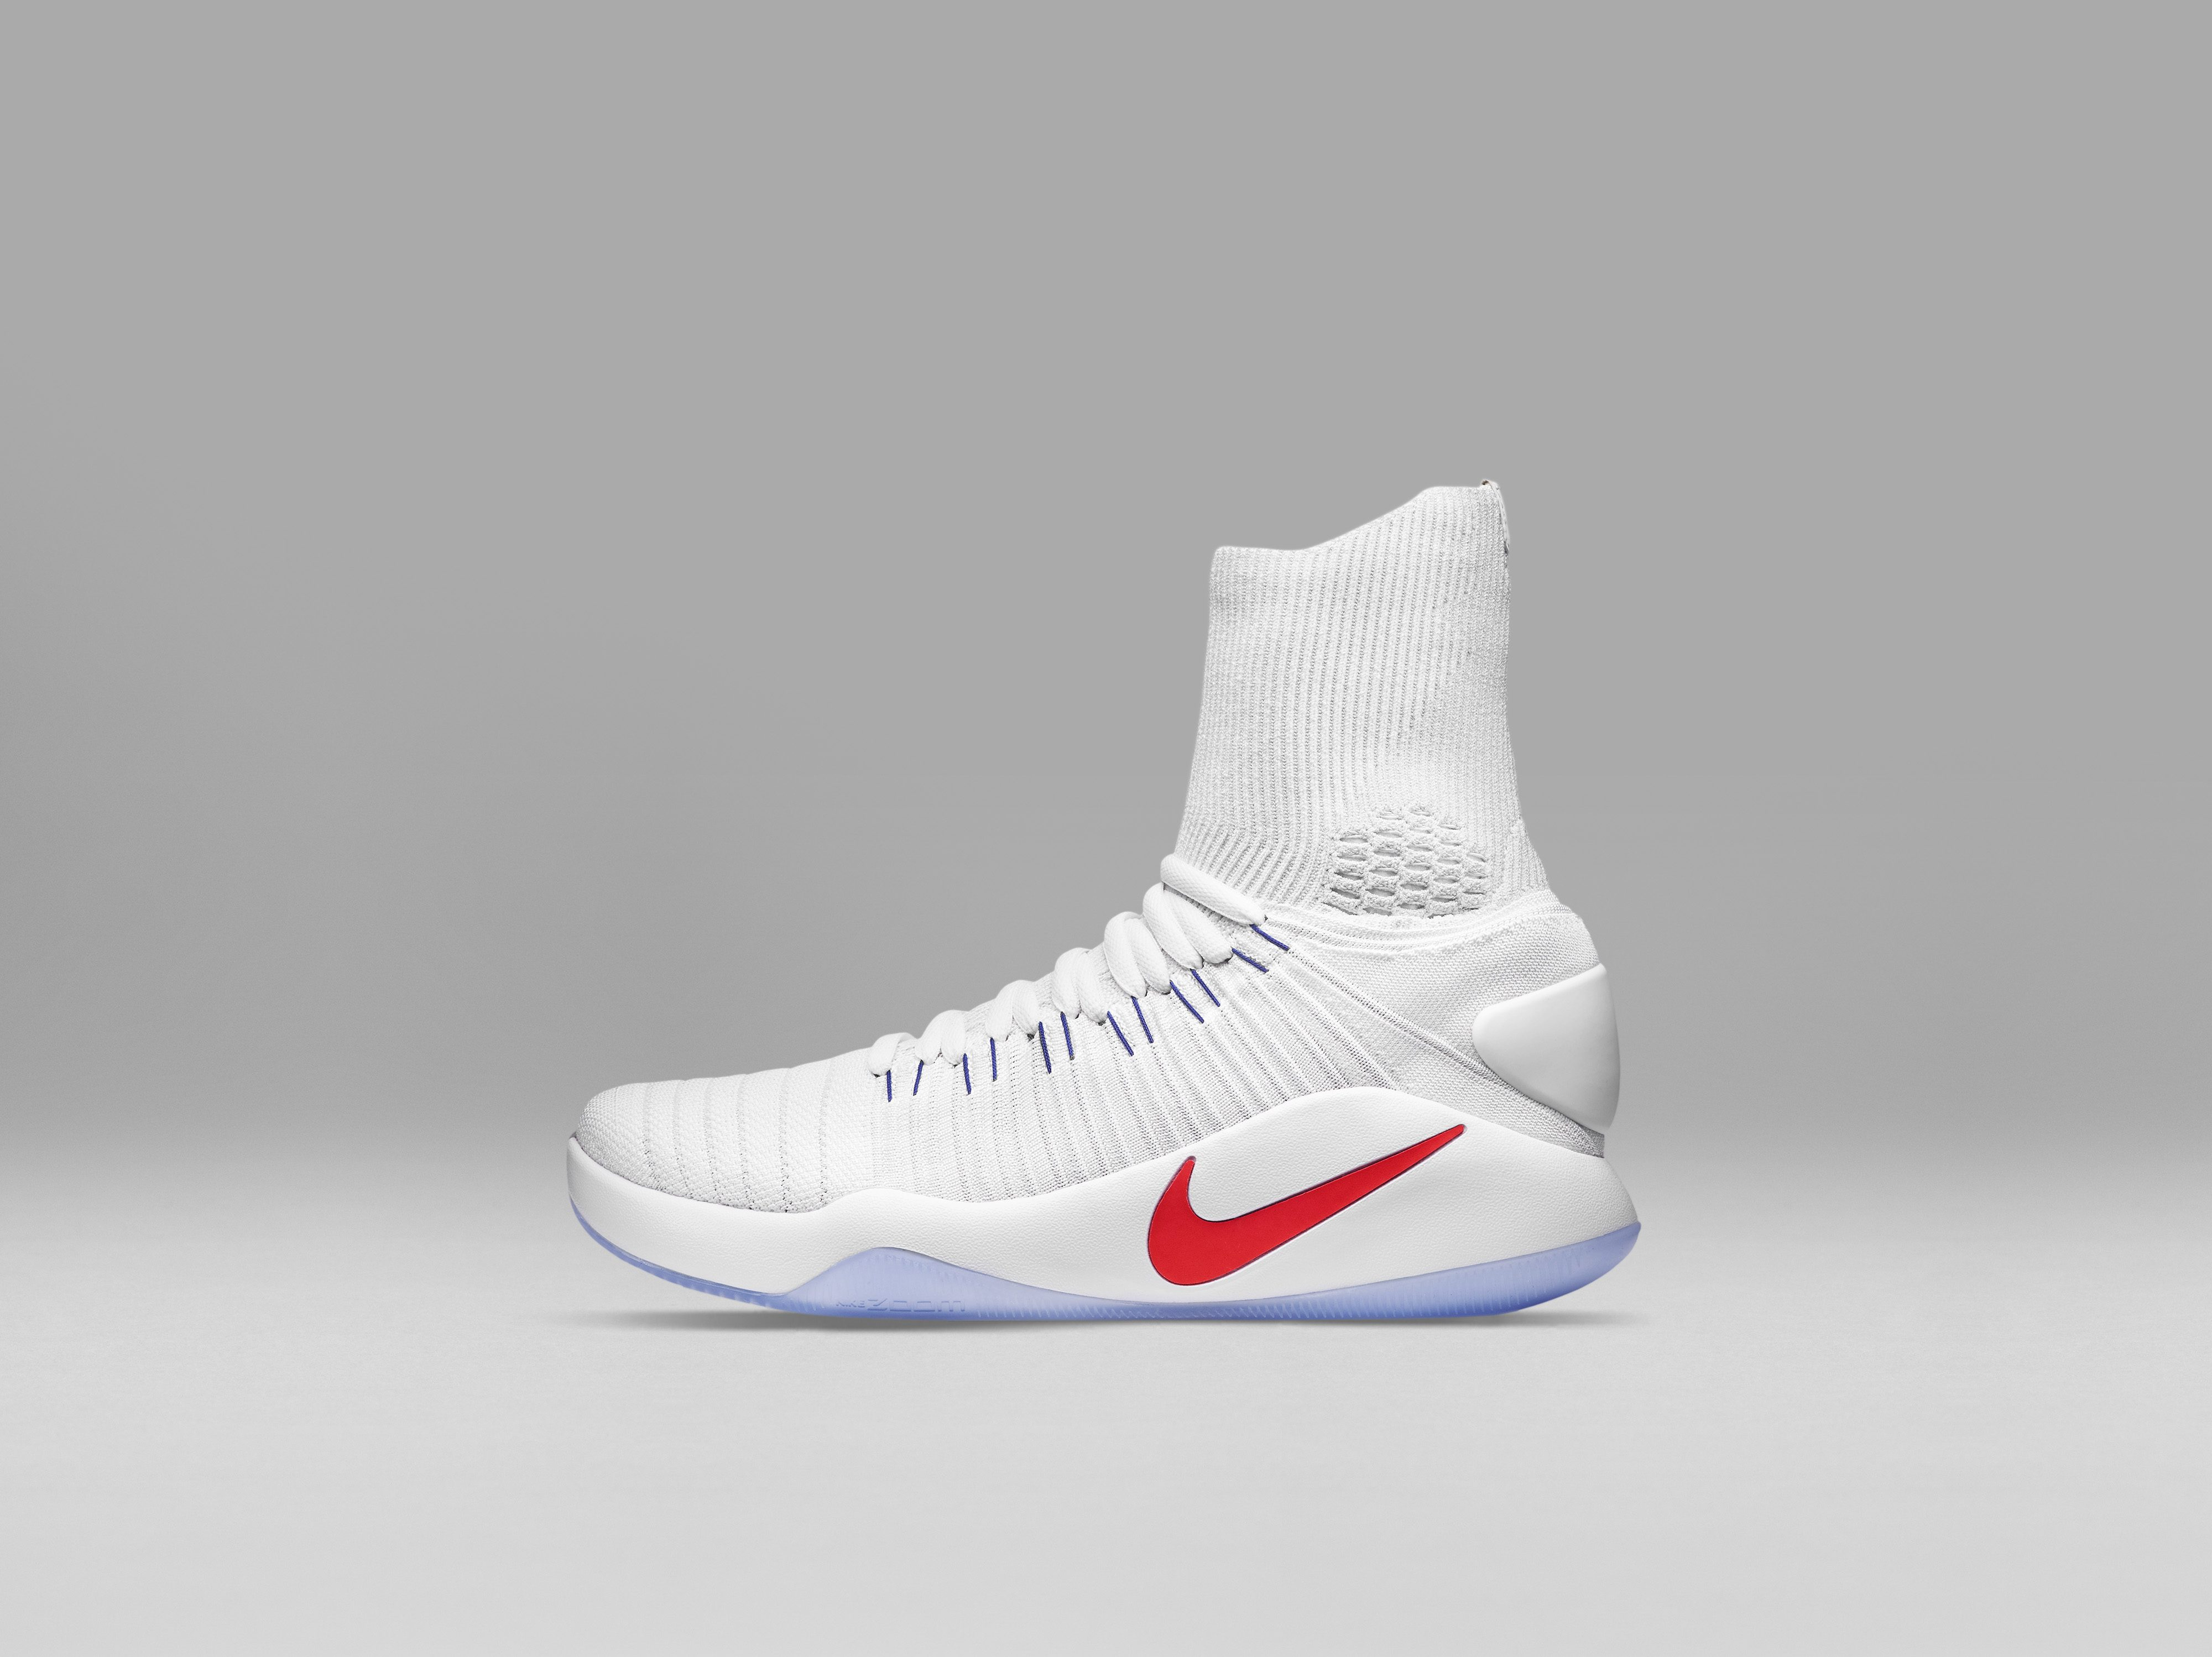 Nike_Hyperdunk_2016_Profile_original.jpg